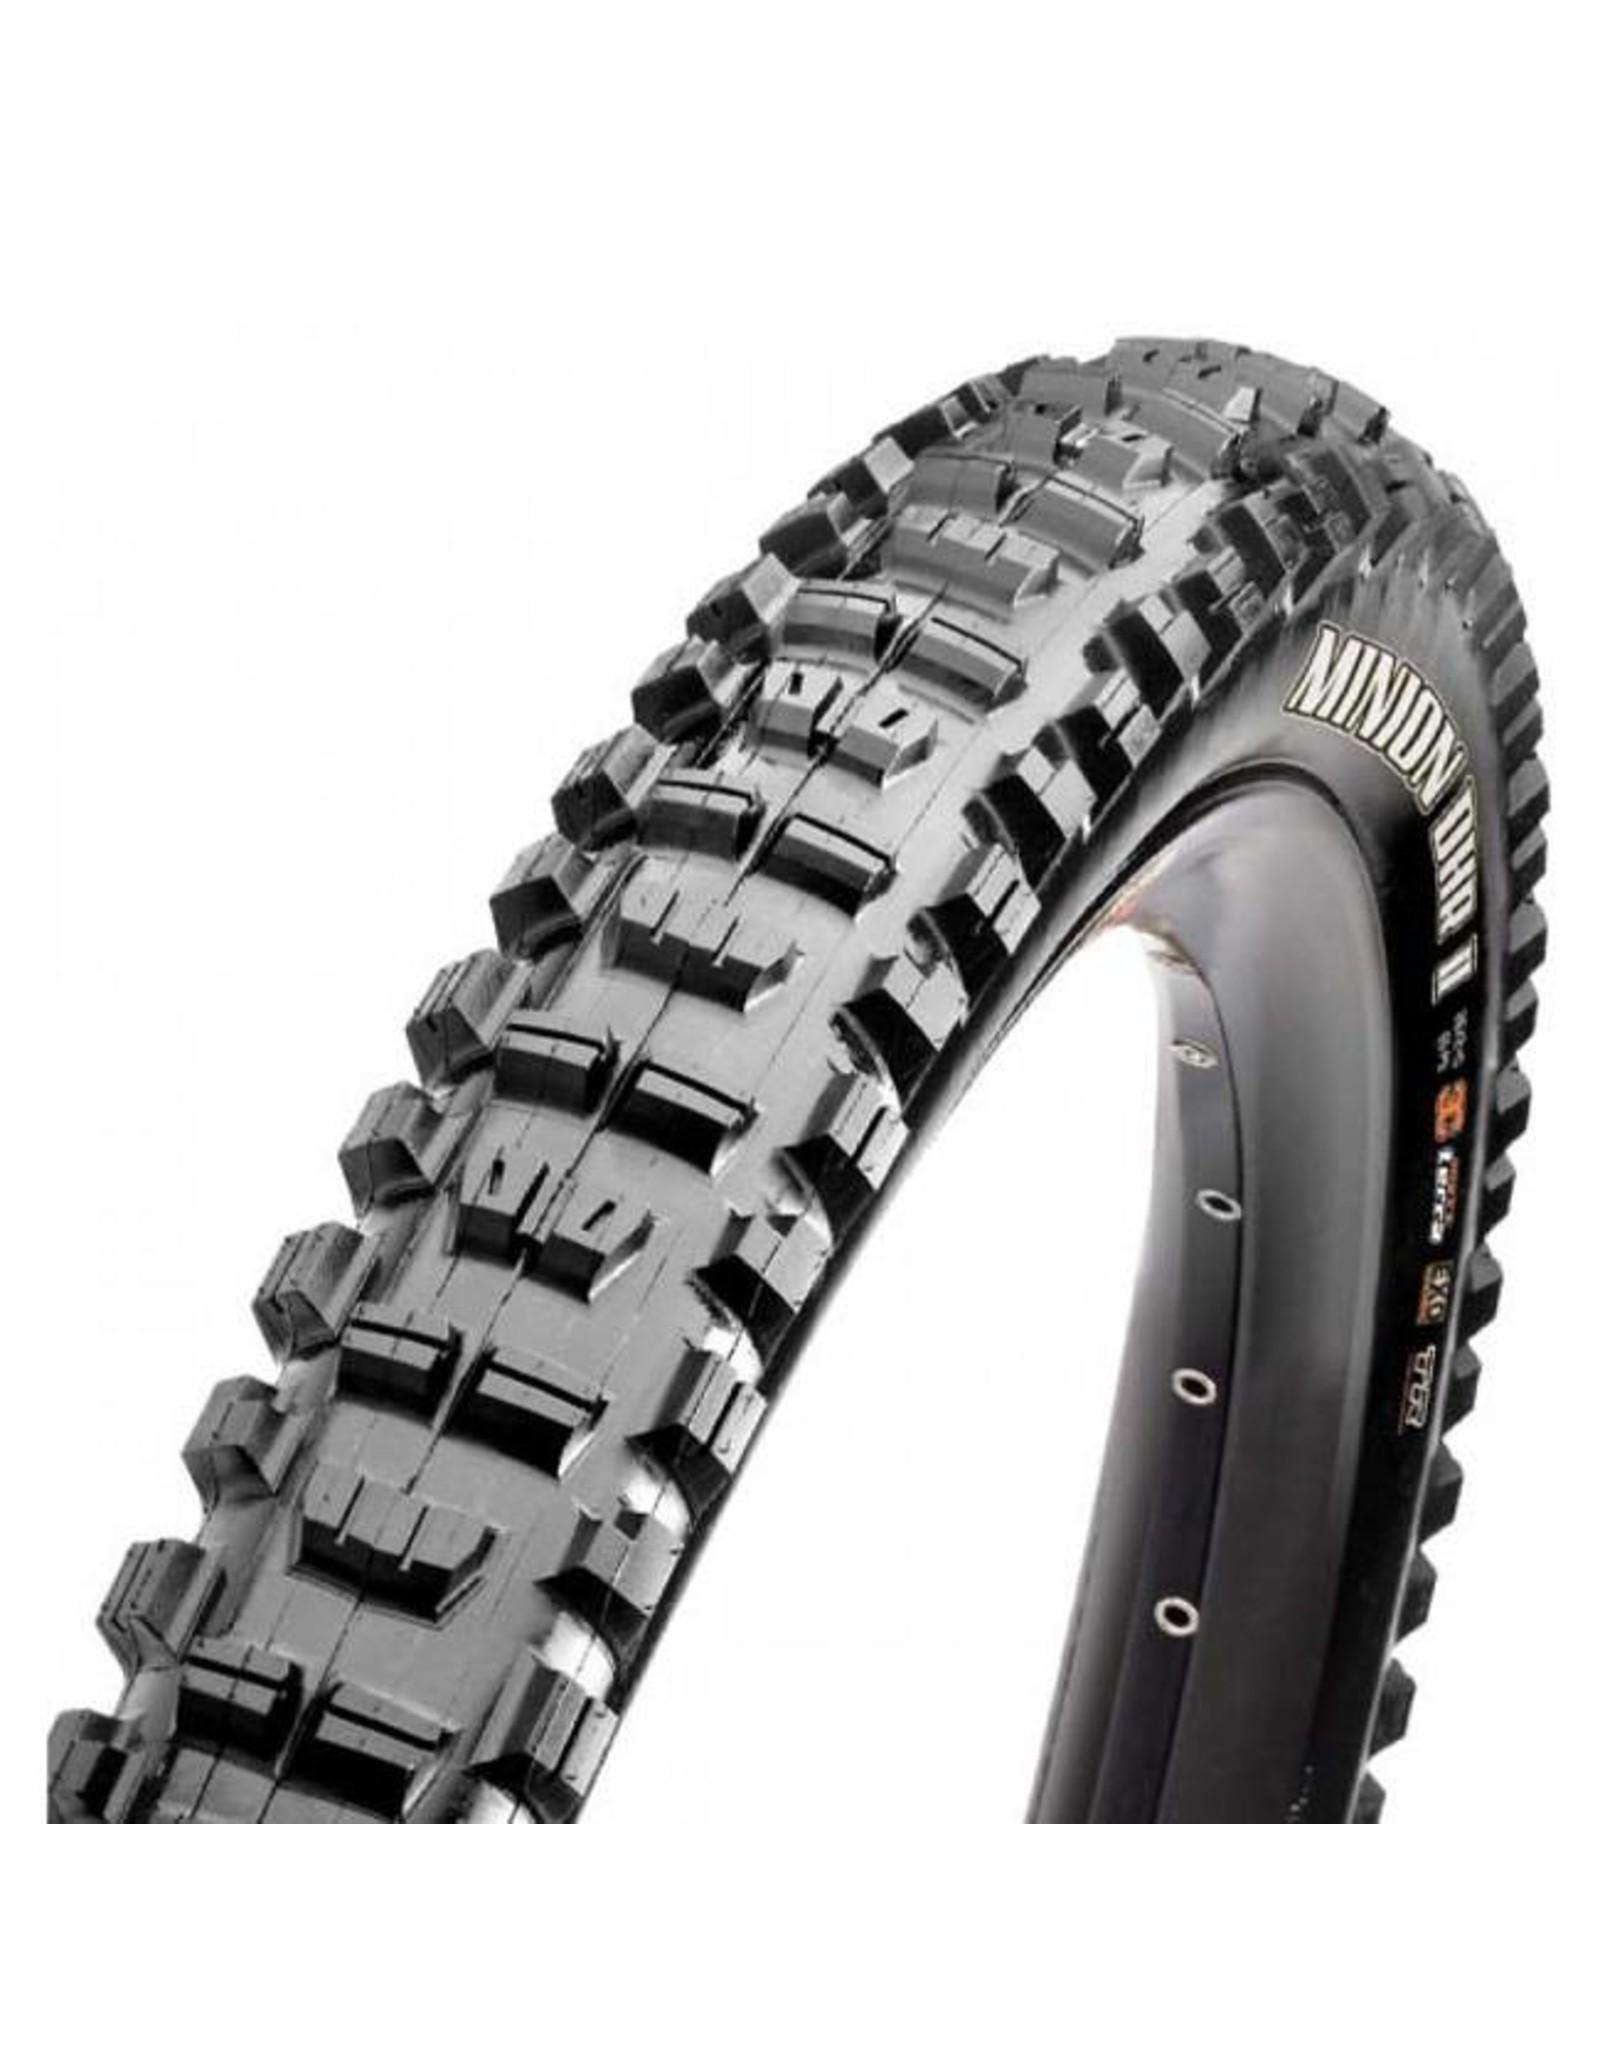 "Maxxis Maxxis Minion DHR II Tire: 29 x 2.30"", Folding, 60tpi, Dual Compound, EXO, Tubeless Ready, Black"